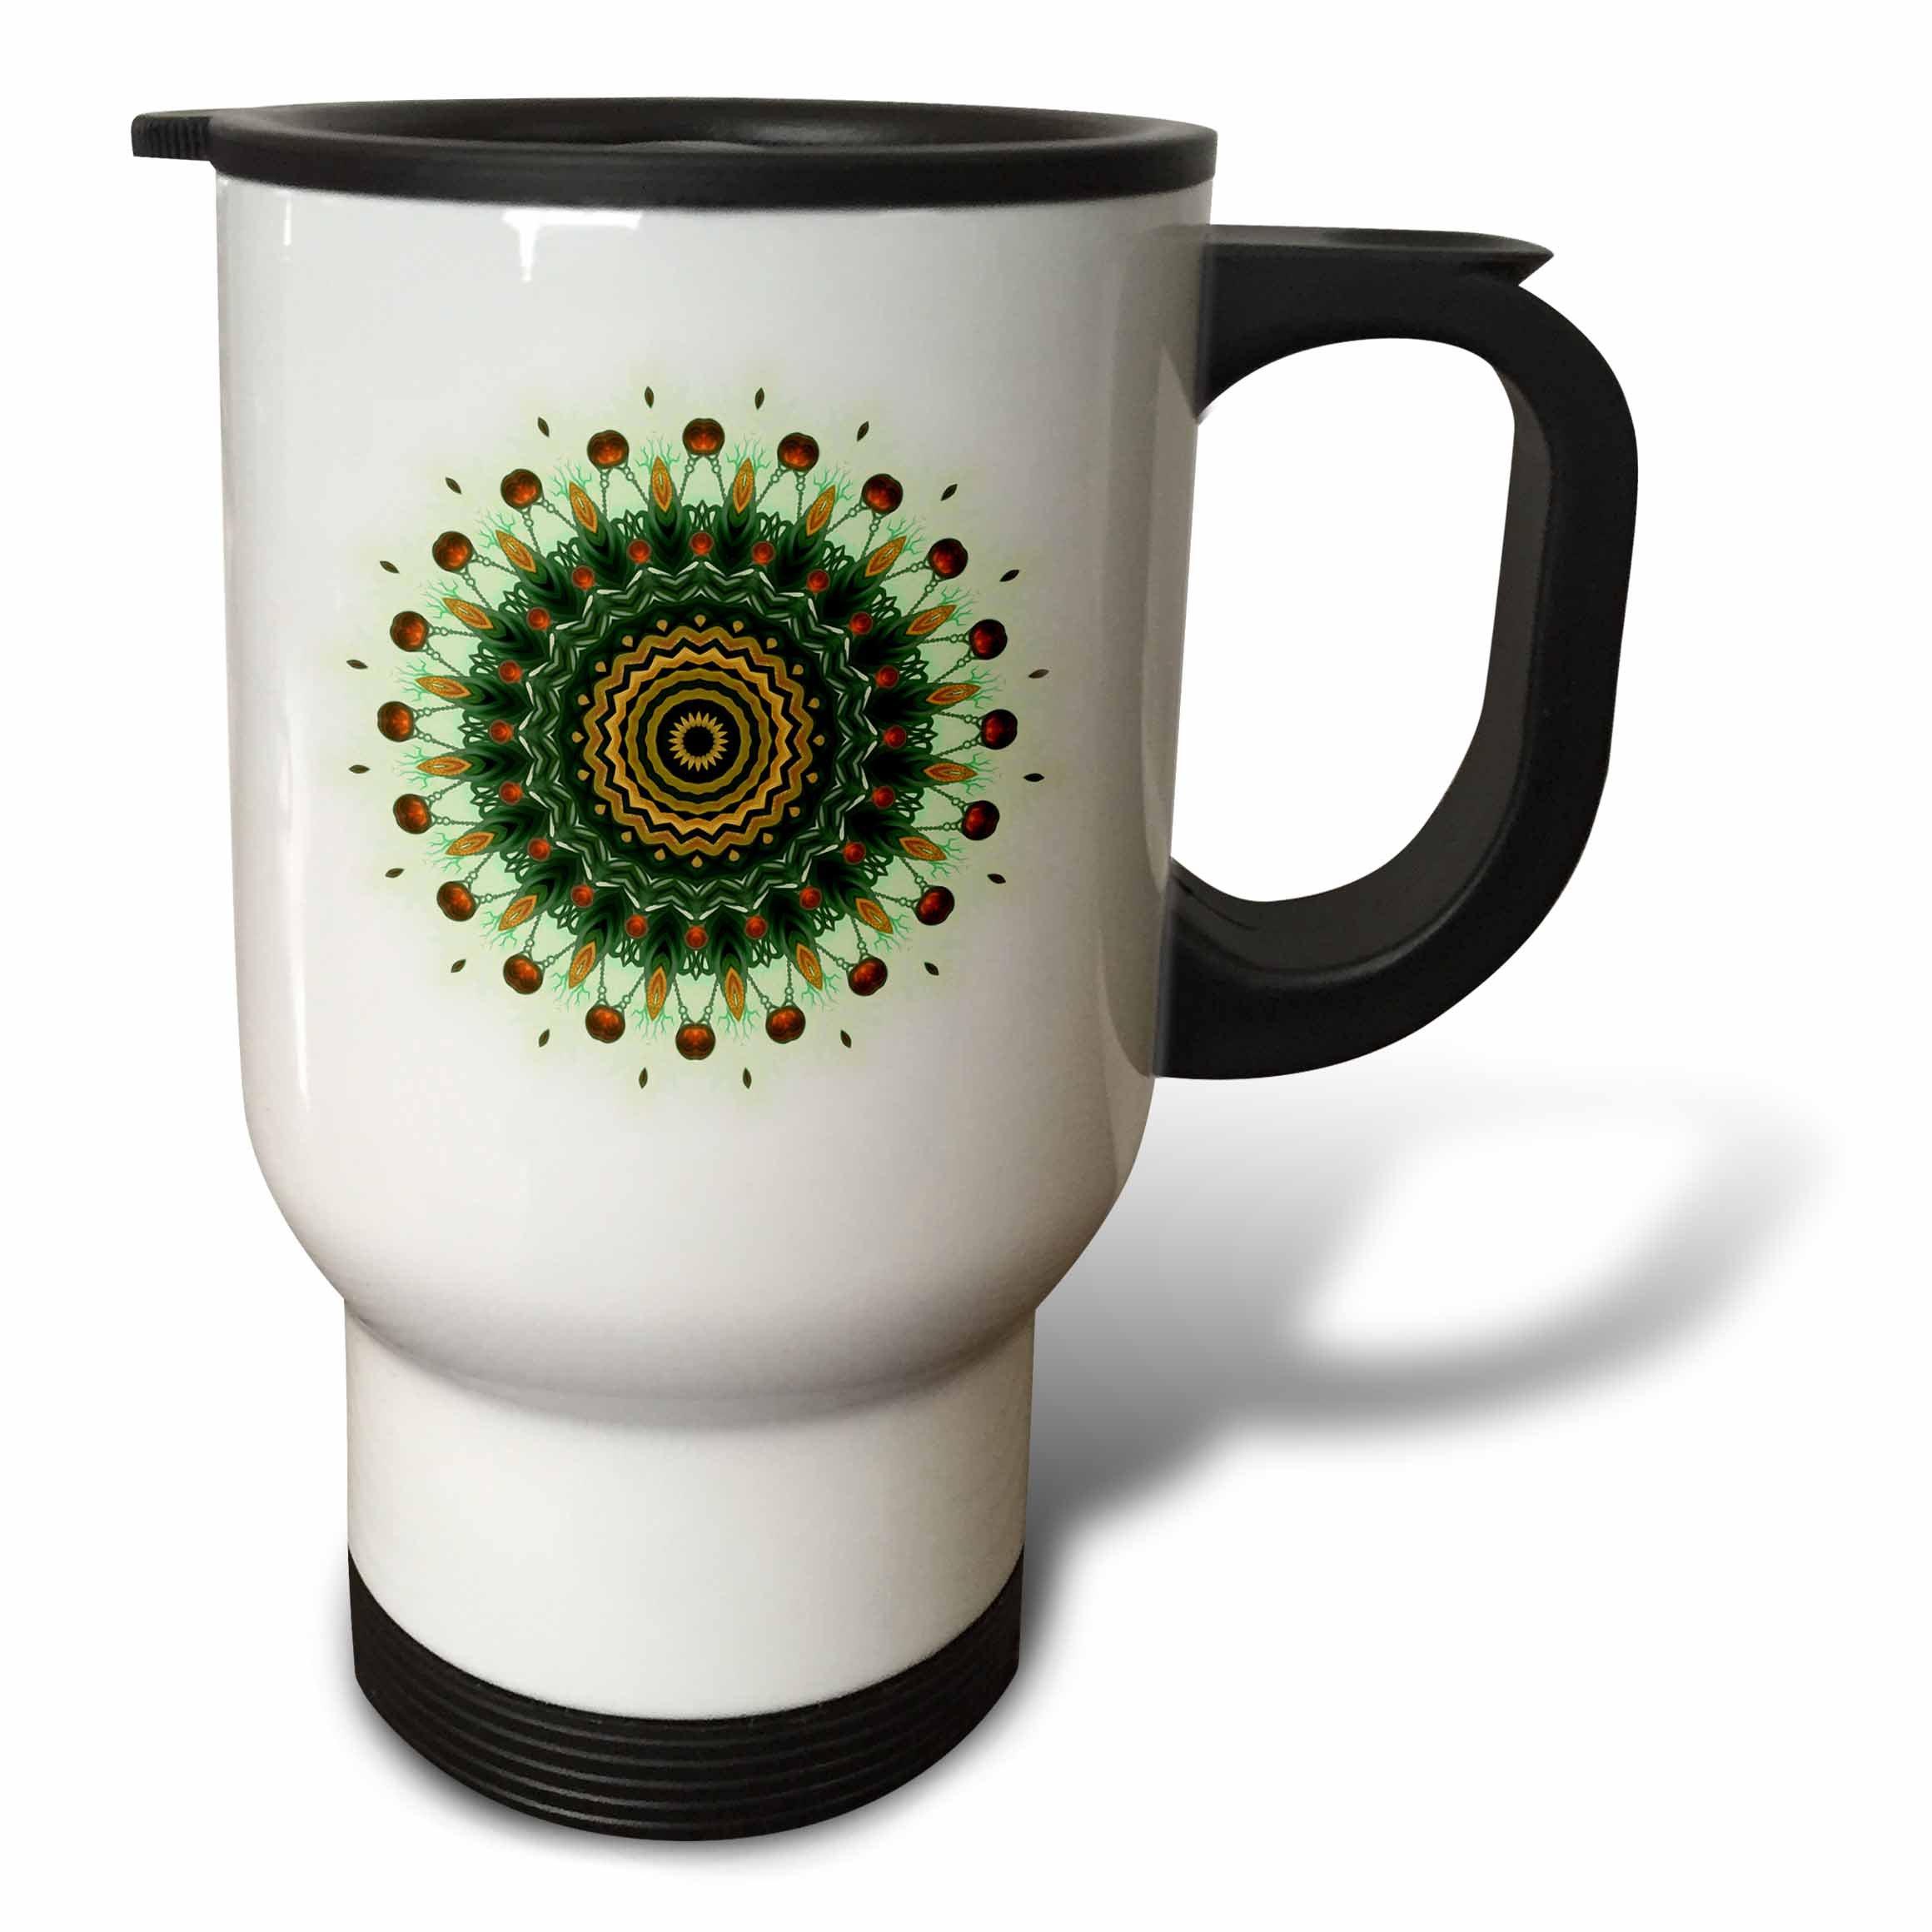 3dRose India Ornament Flake Mandala Stainless Steel Travel Mug, 14-Ounce